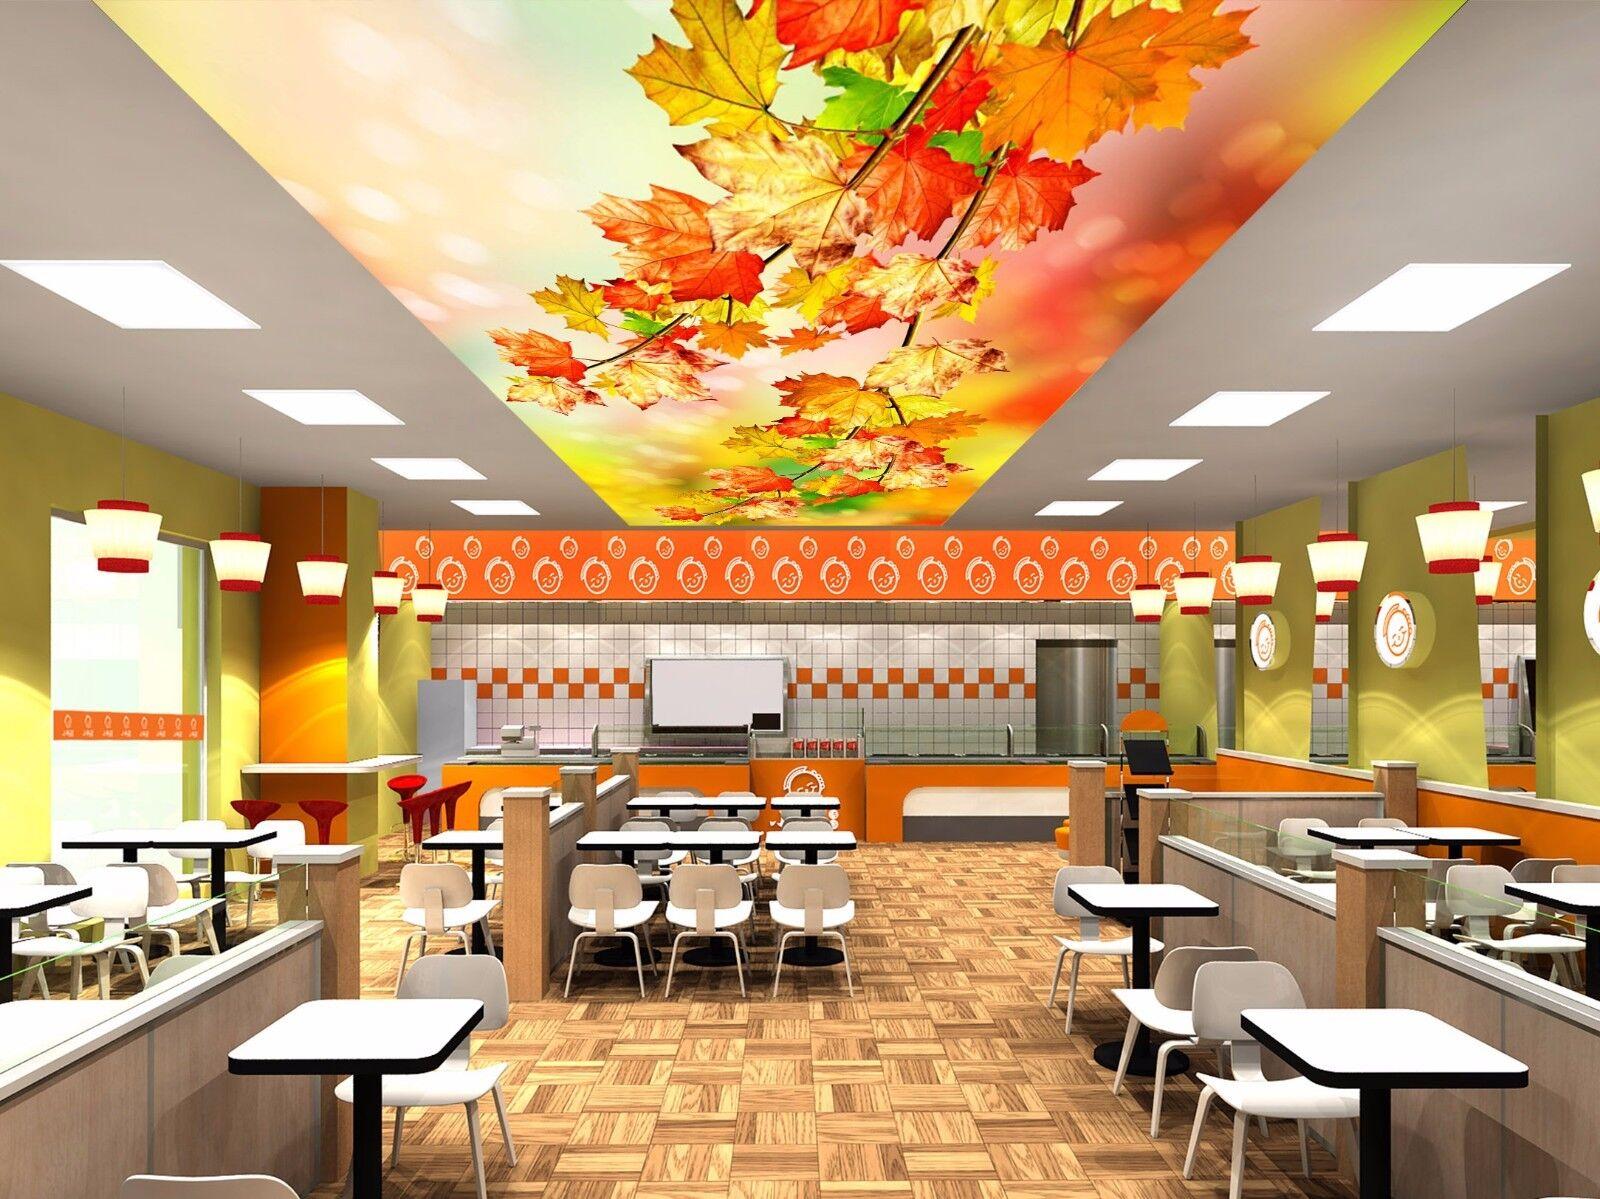 3D Herbst Ahornbltter 52 Fototapeten Wandbild Fototapete BildTapete DE Kyra